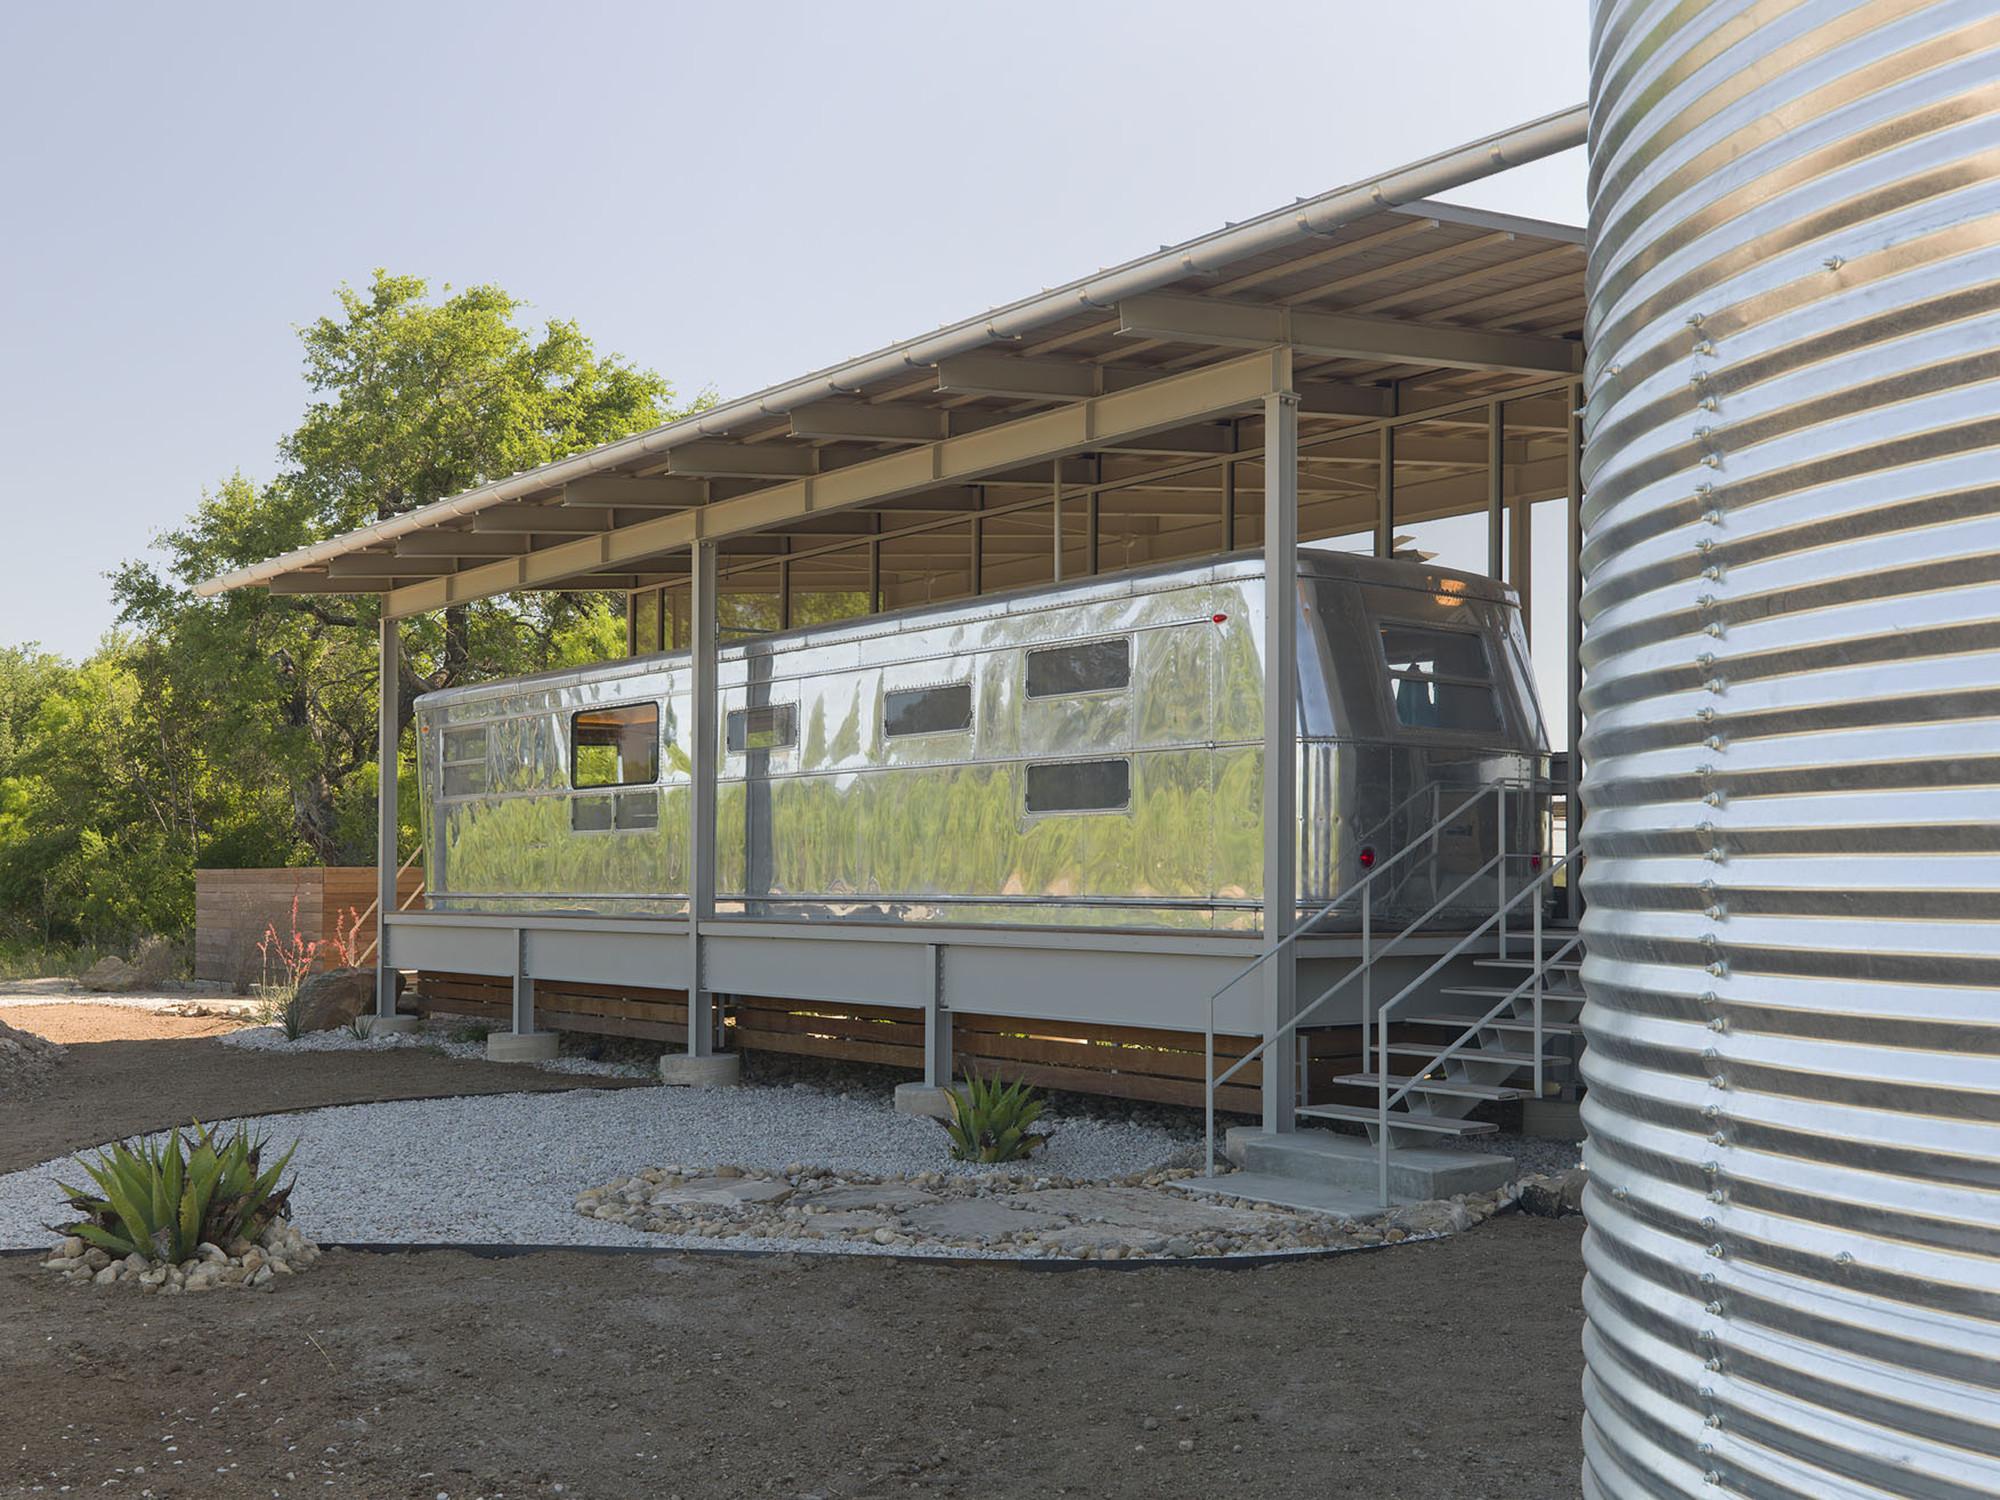 Gallery Of Locomotive Ranch Trailer Home Andrew Hinman